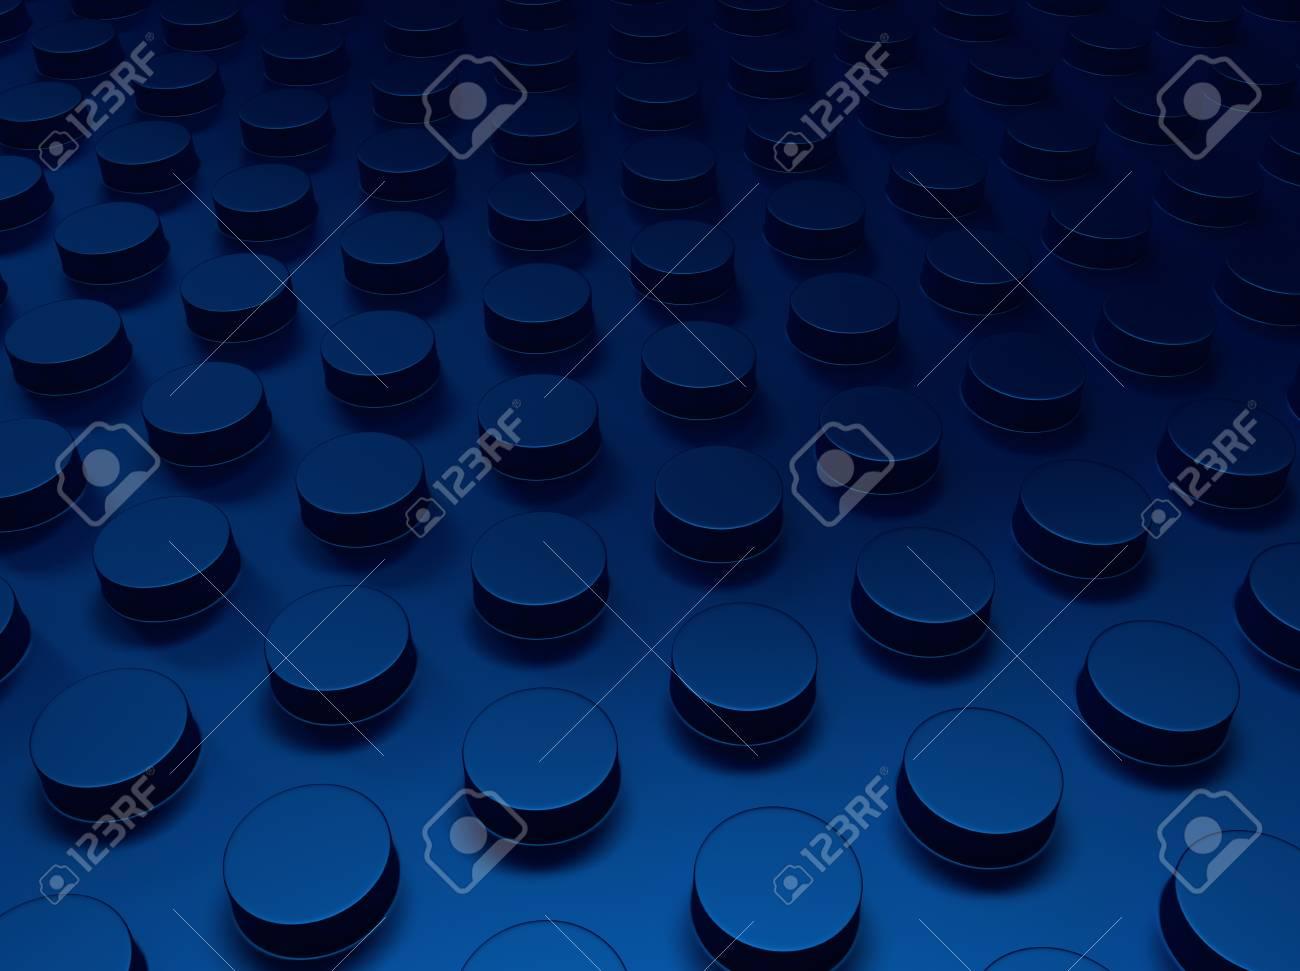 Blue industrial metallic background with dots (floor) Stock Photo - 18701965